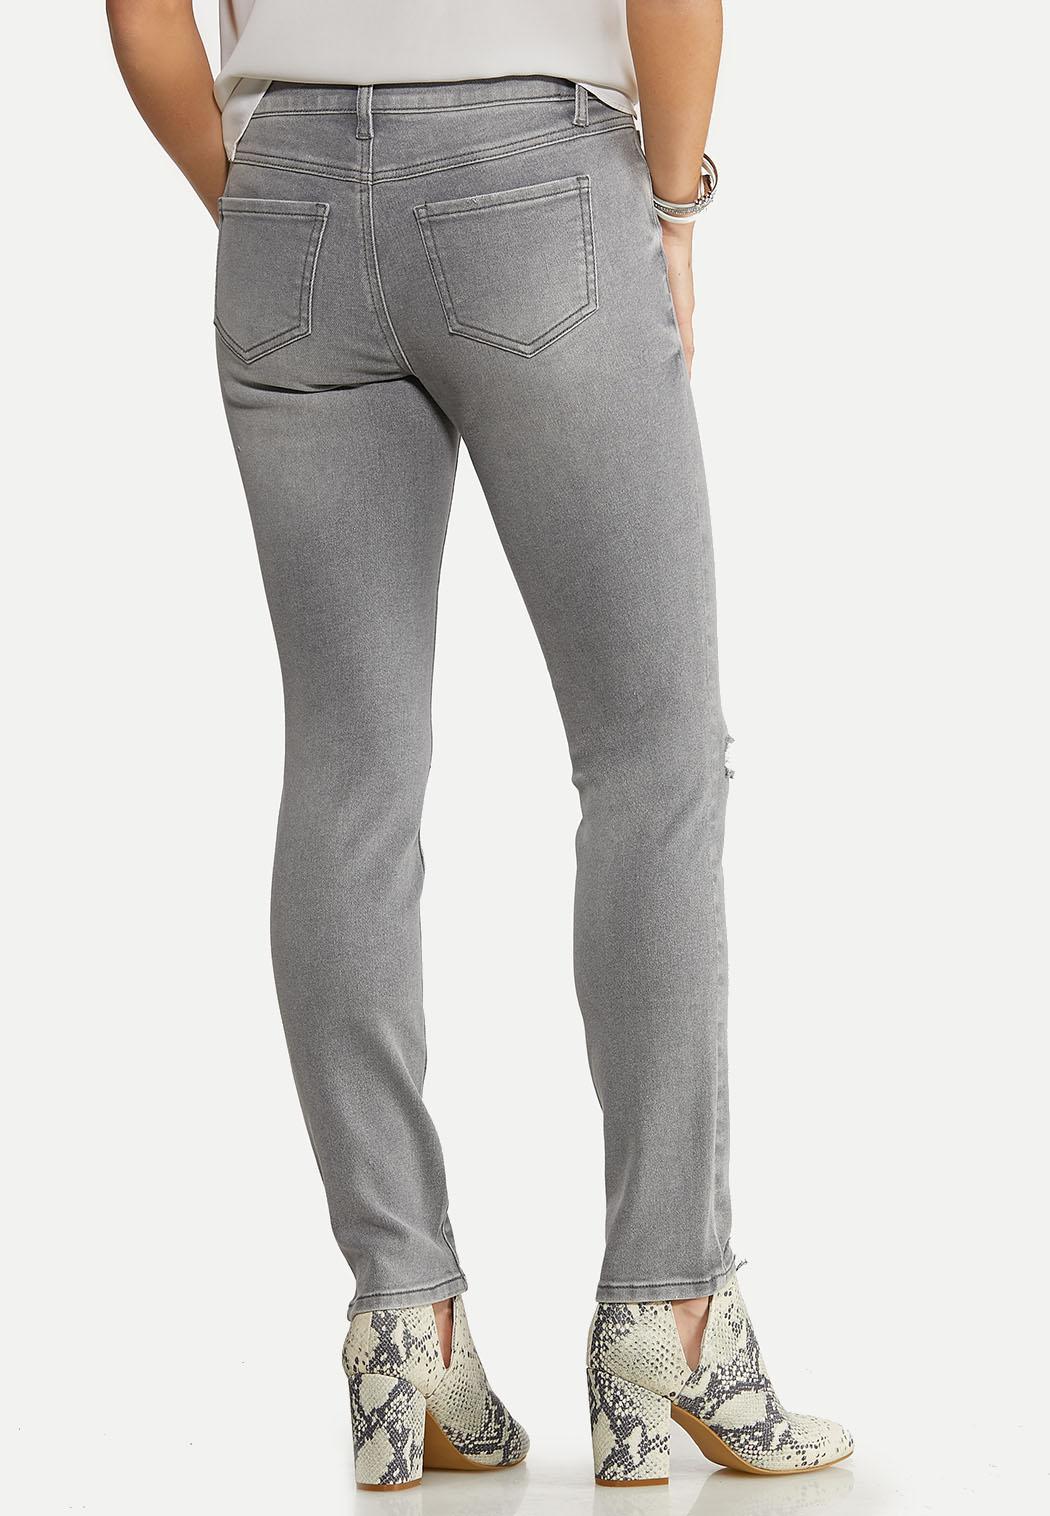 Gray Destructed Skinny Jeans (Item #44098219)